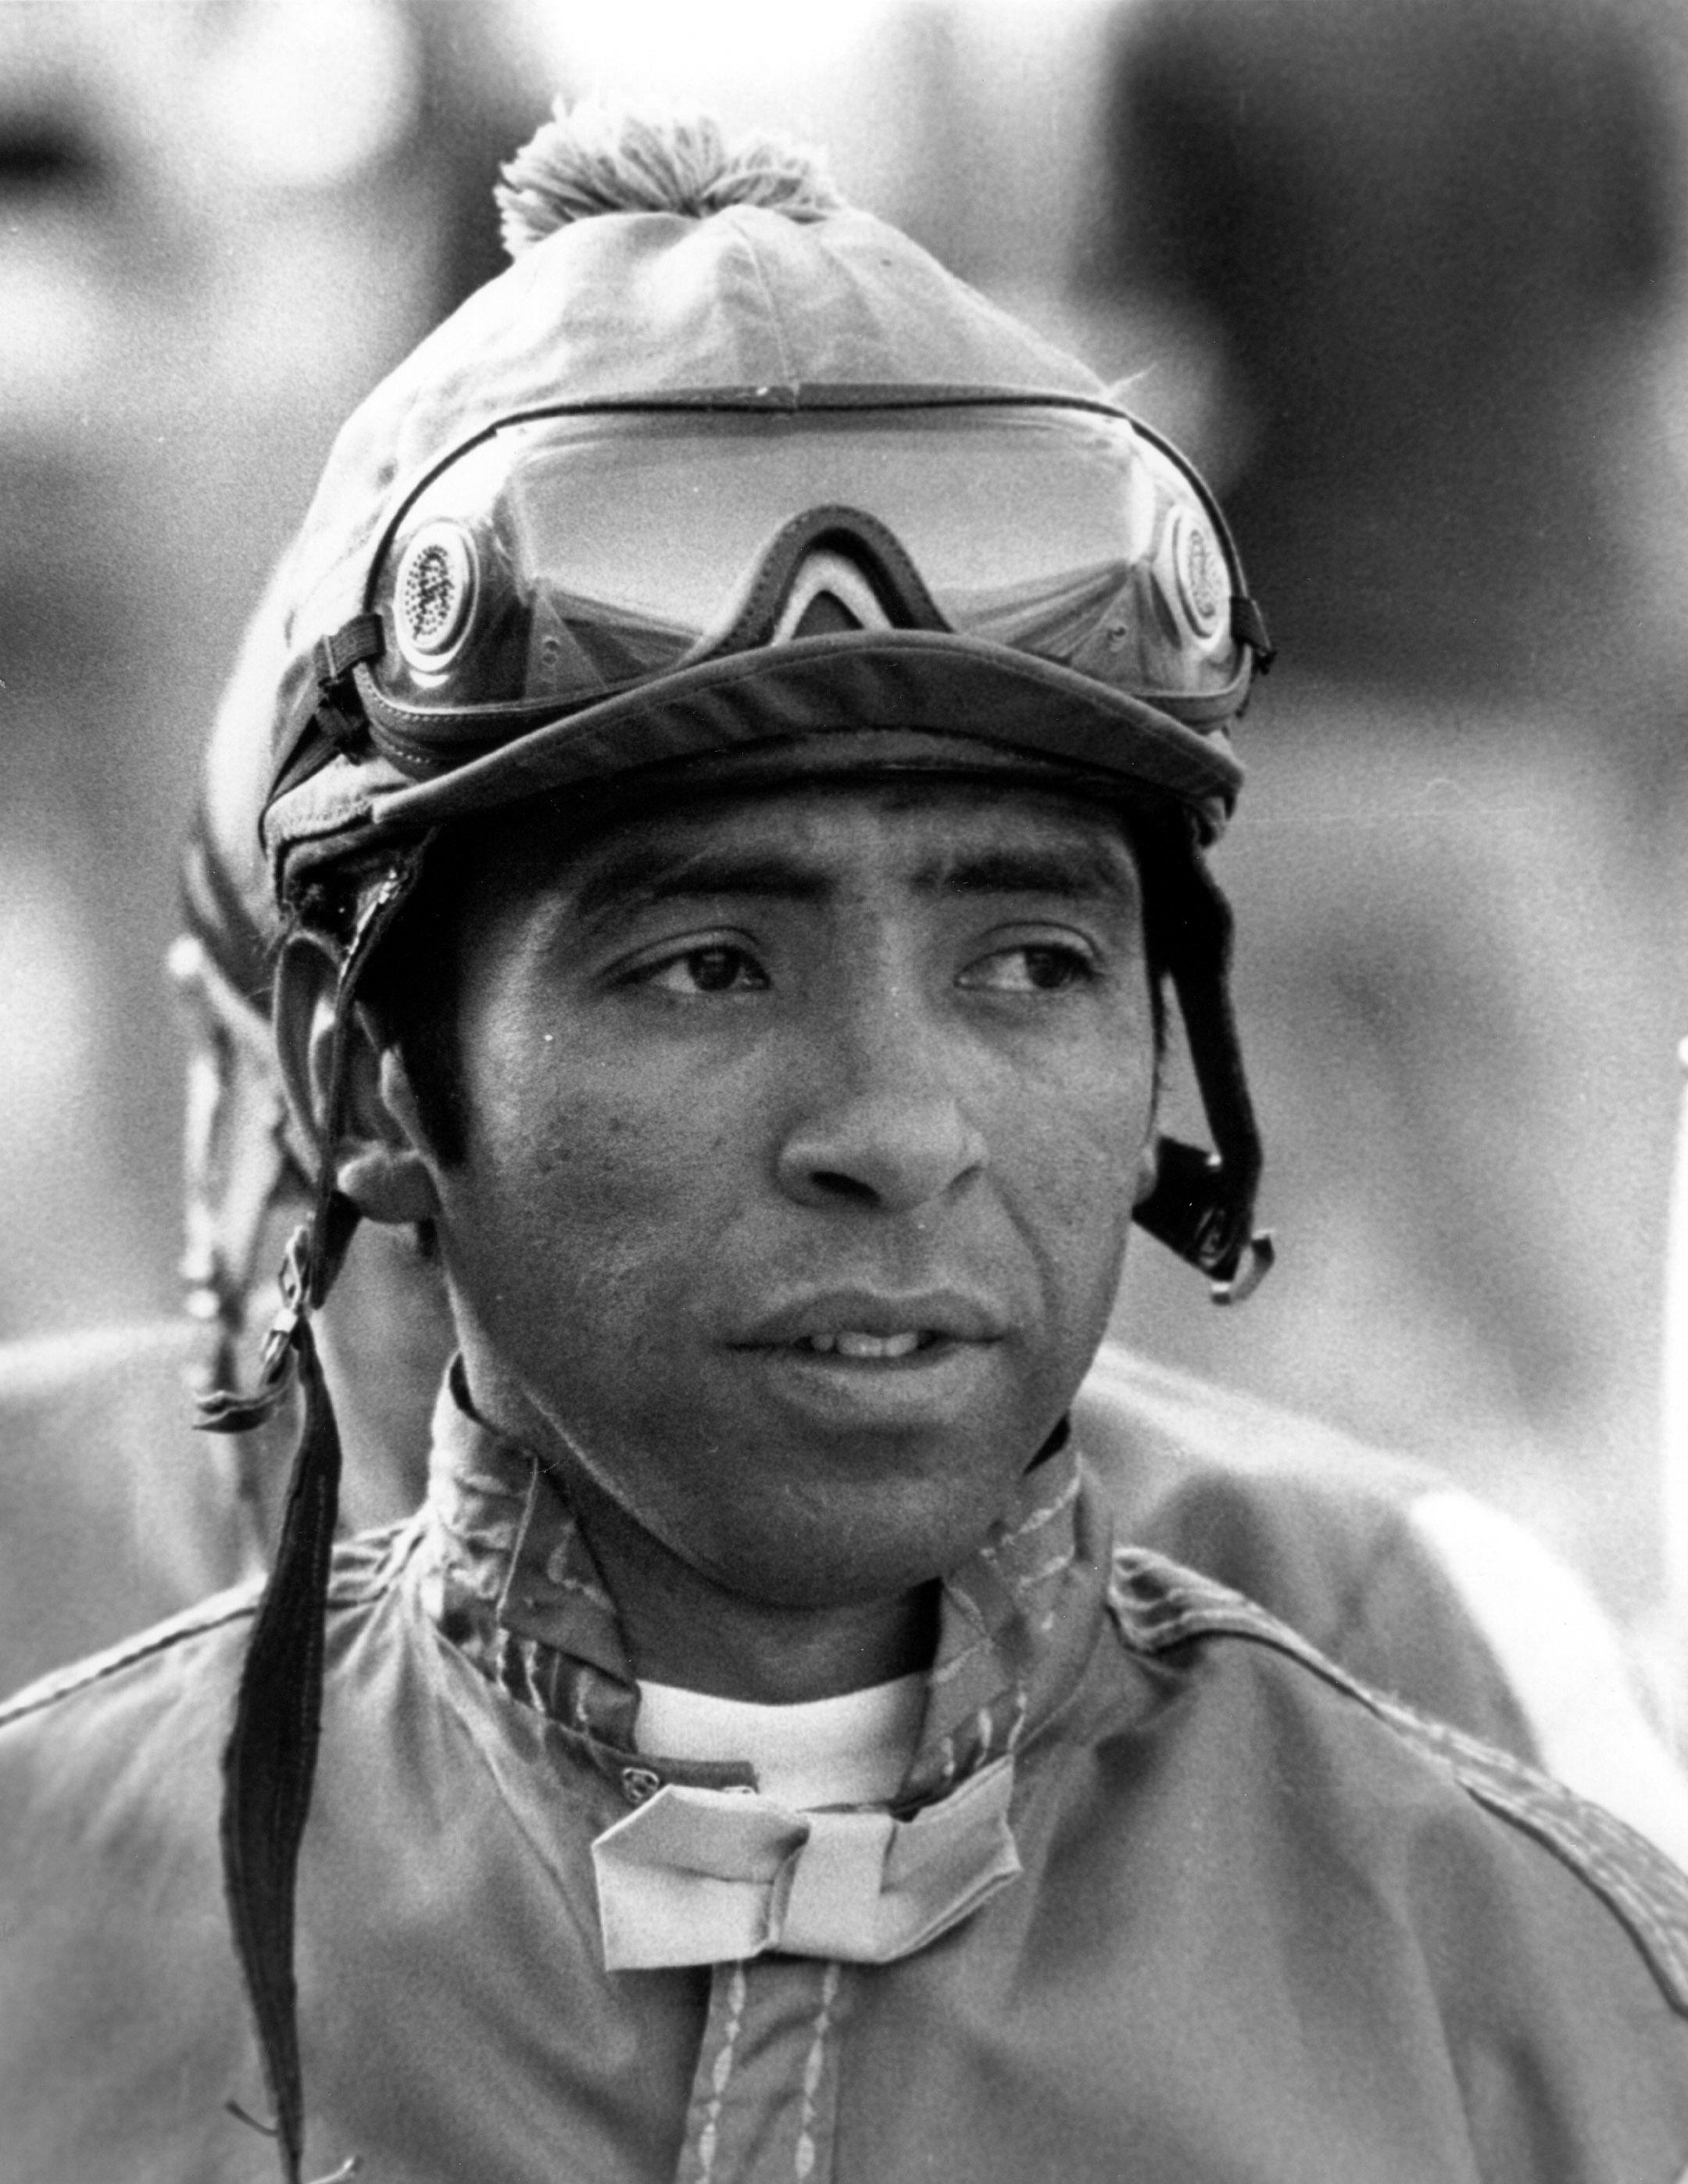 Angel Cordero, Jr. at Santa Anita Park, March 1979 (Bill Mochon/Museum Collection)